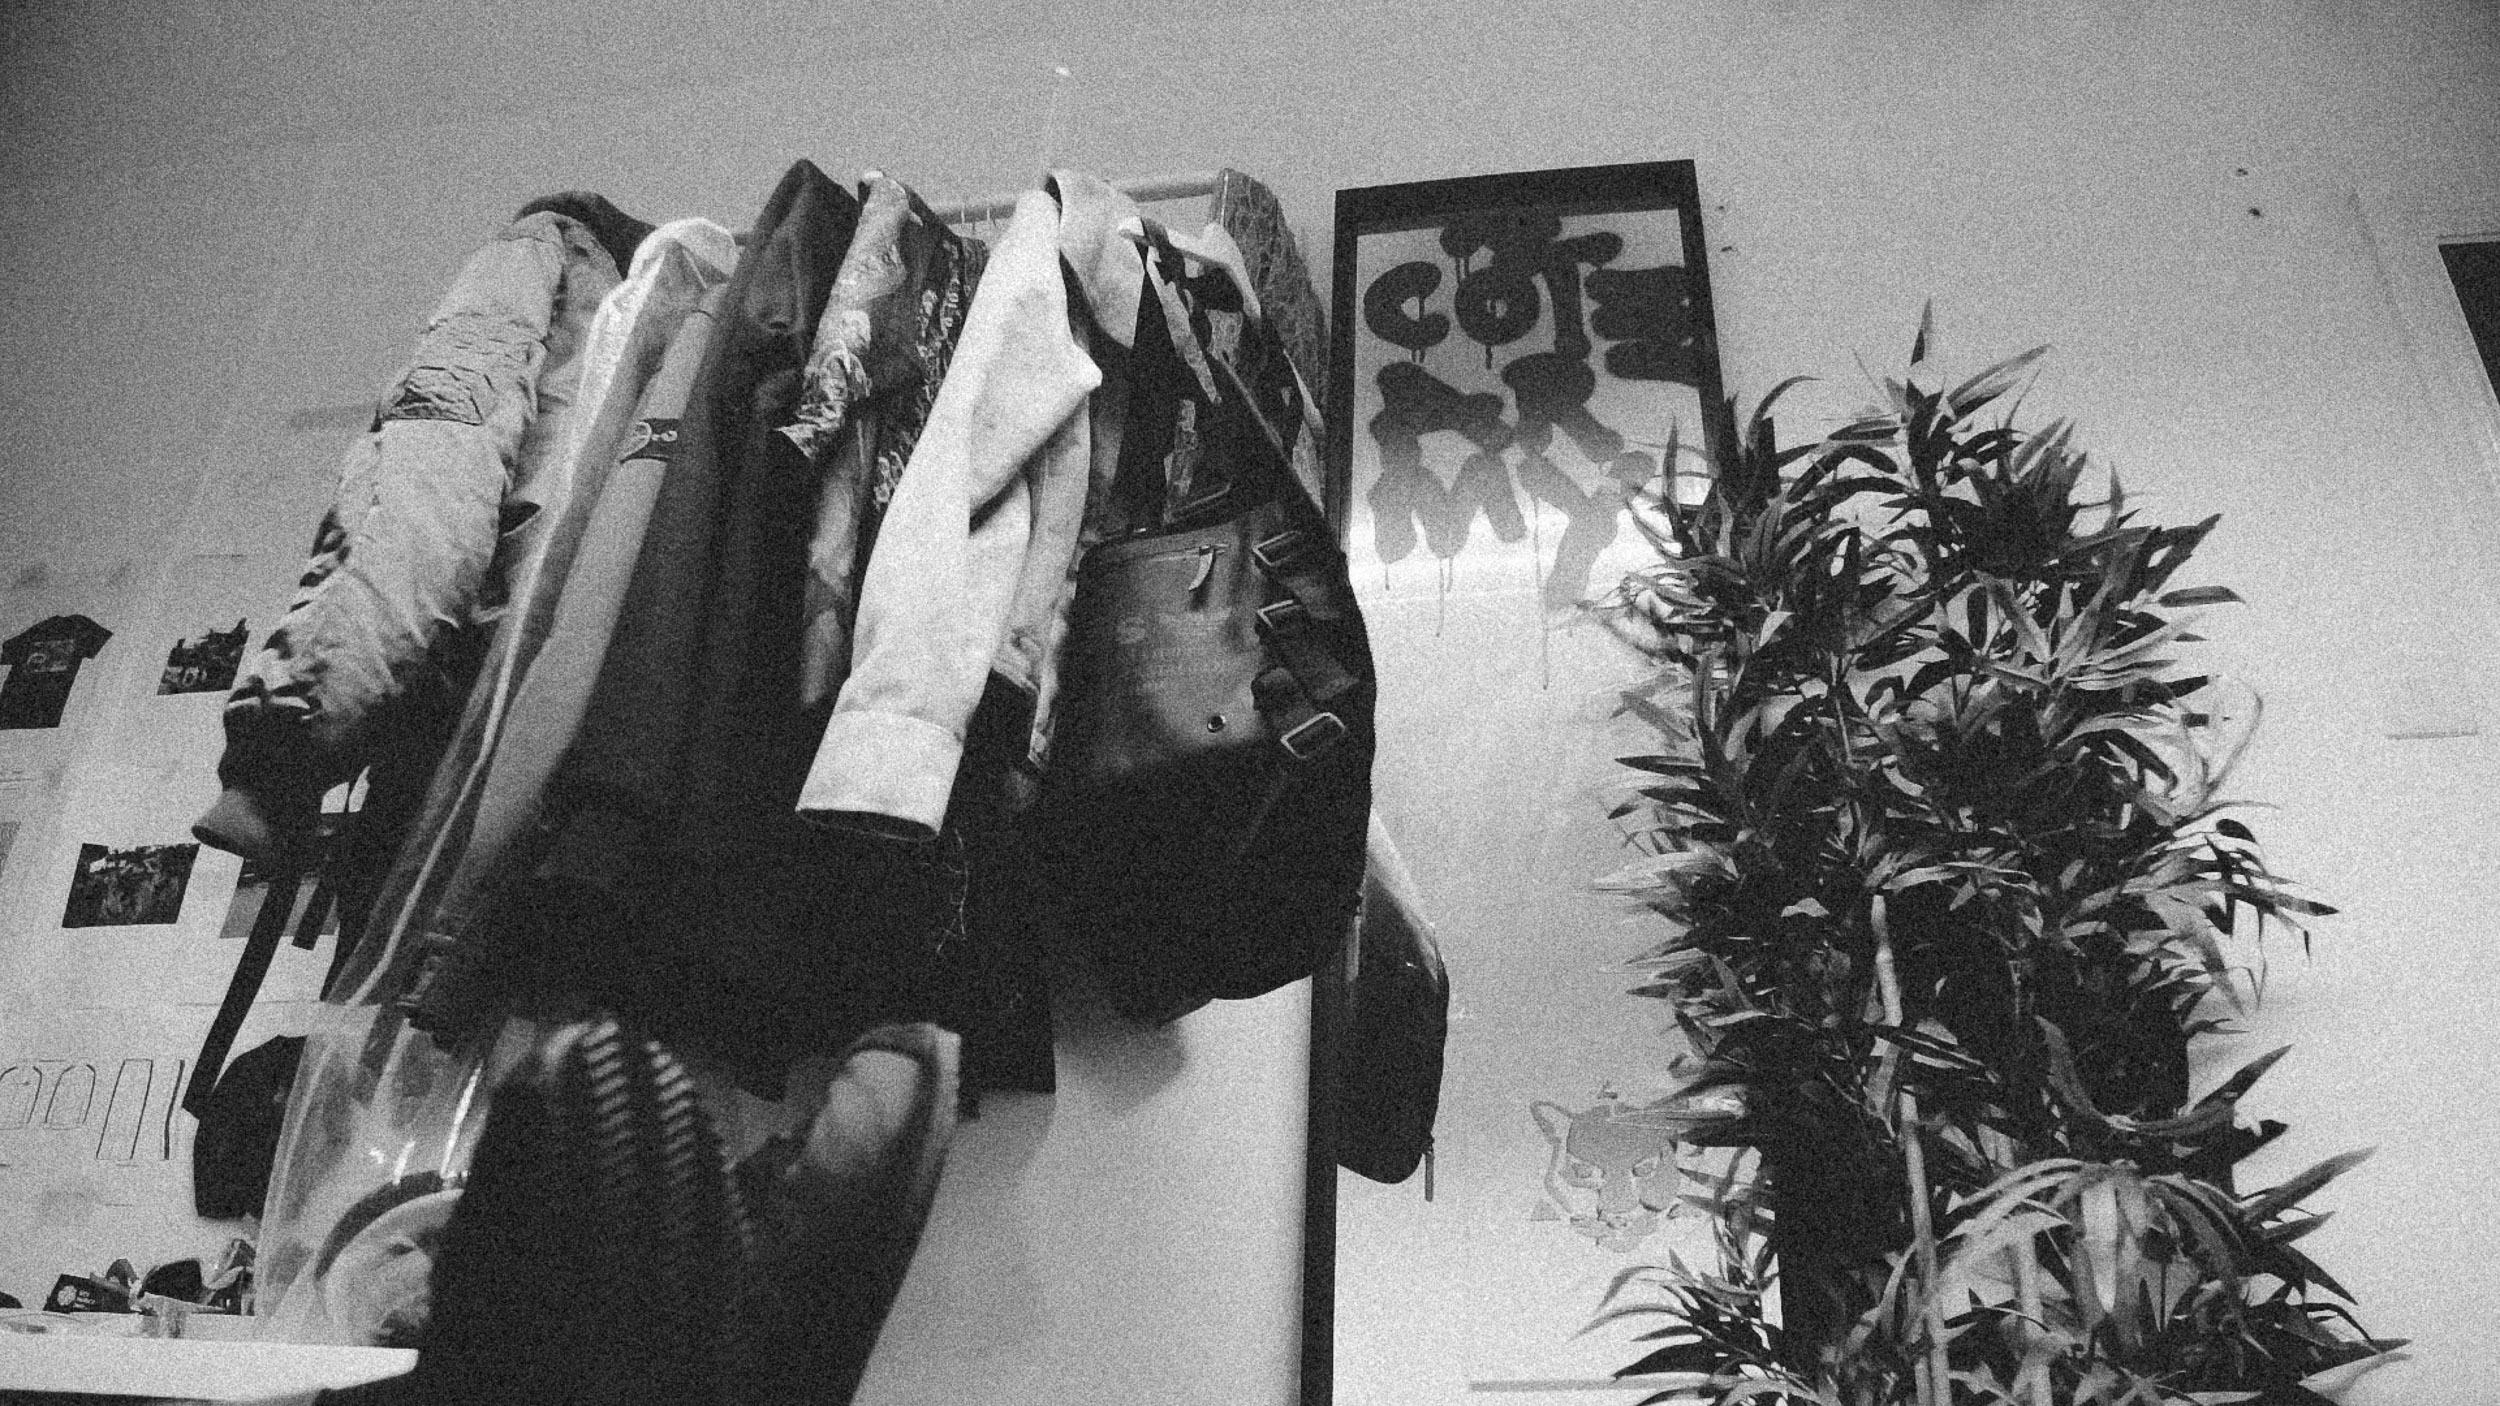 film-archive-kc.locke-71.jpg